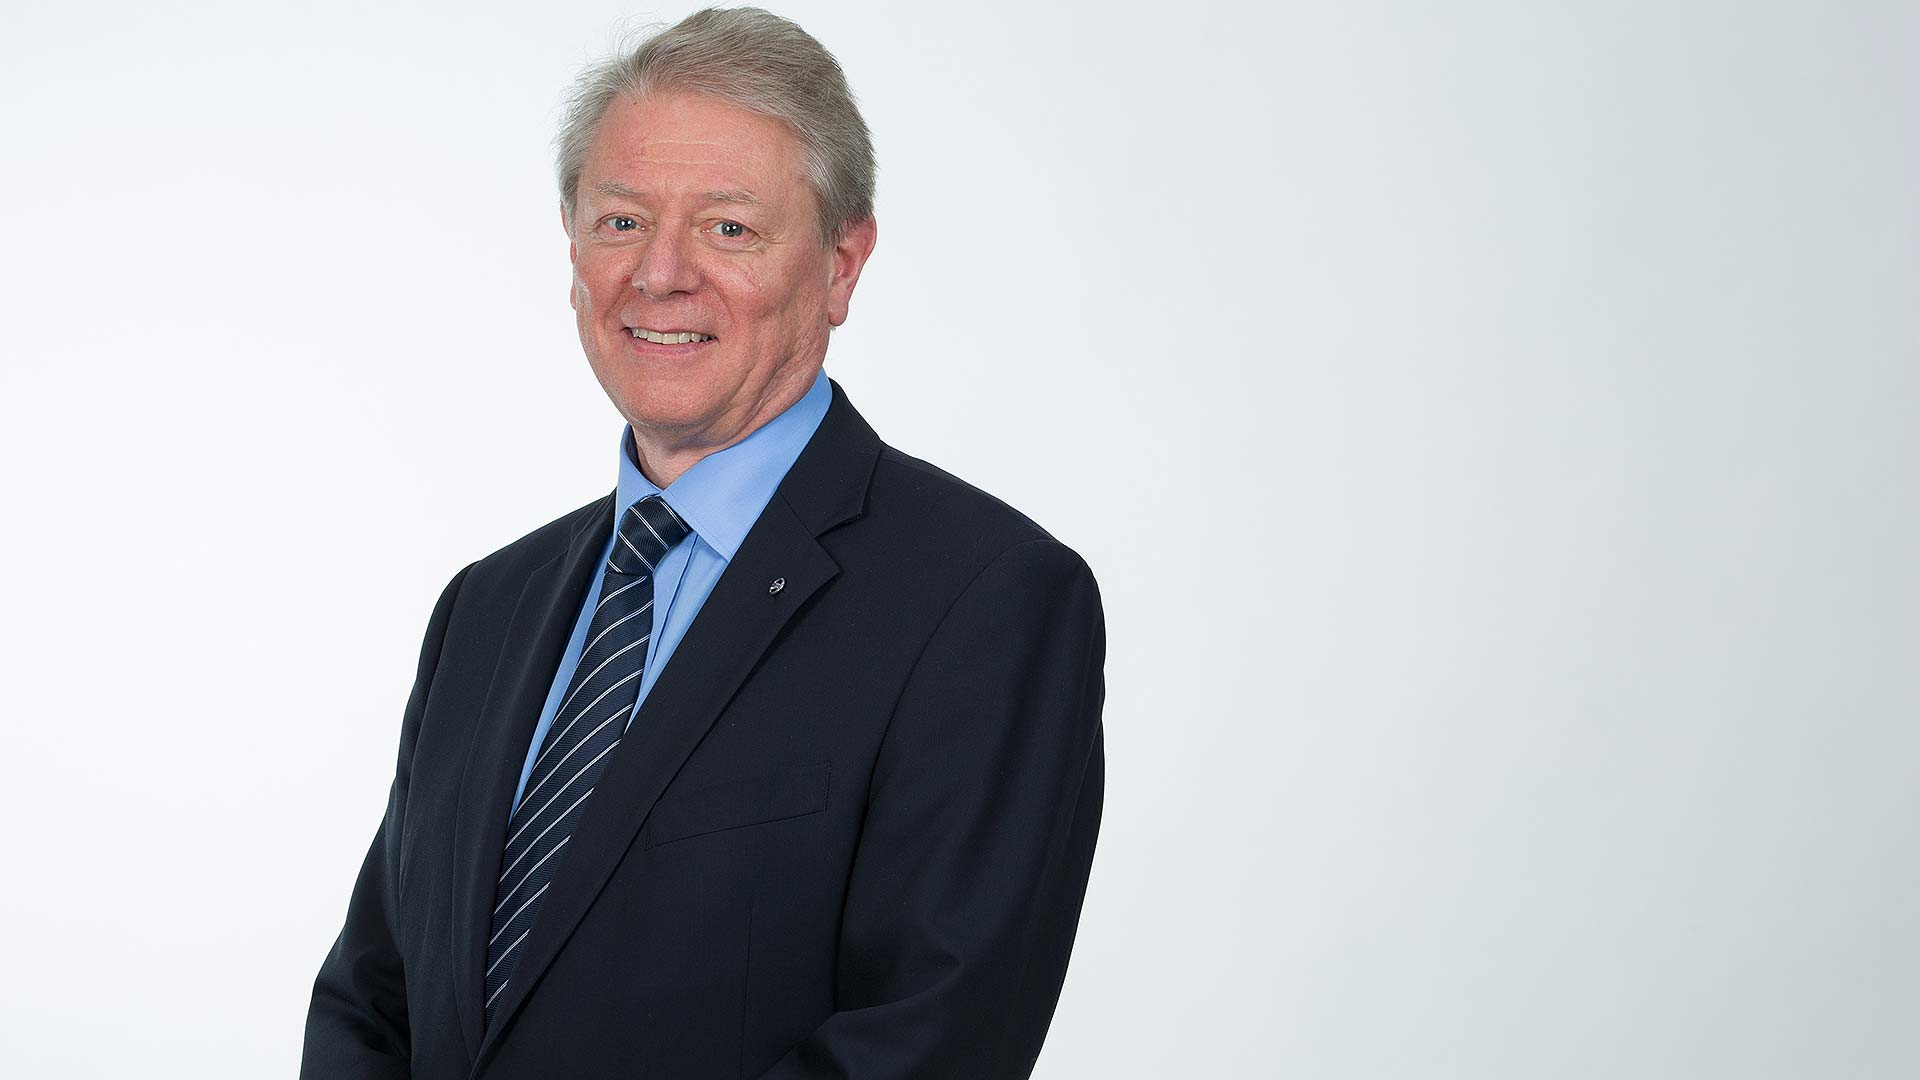 Kevin Fitzpatrick CBE